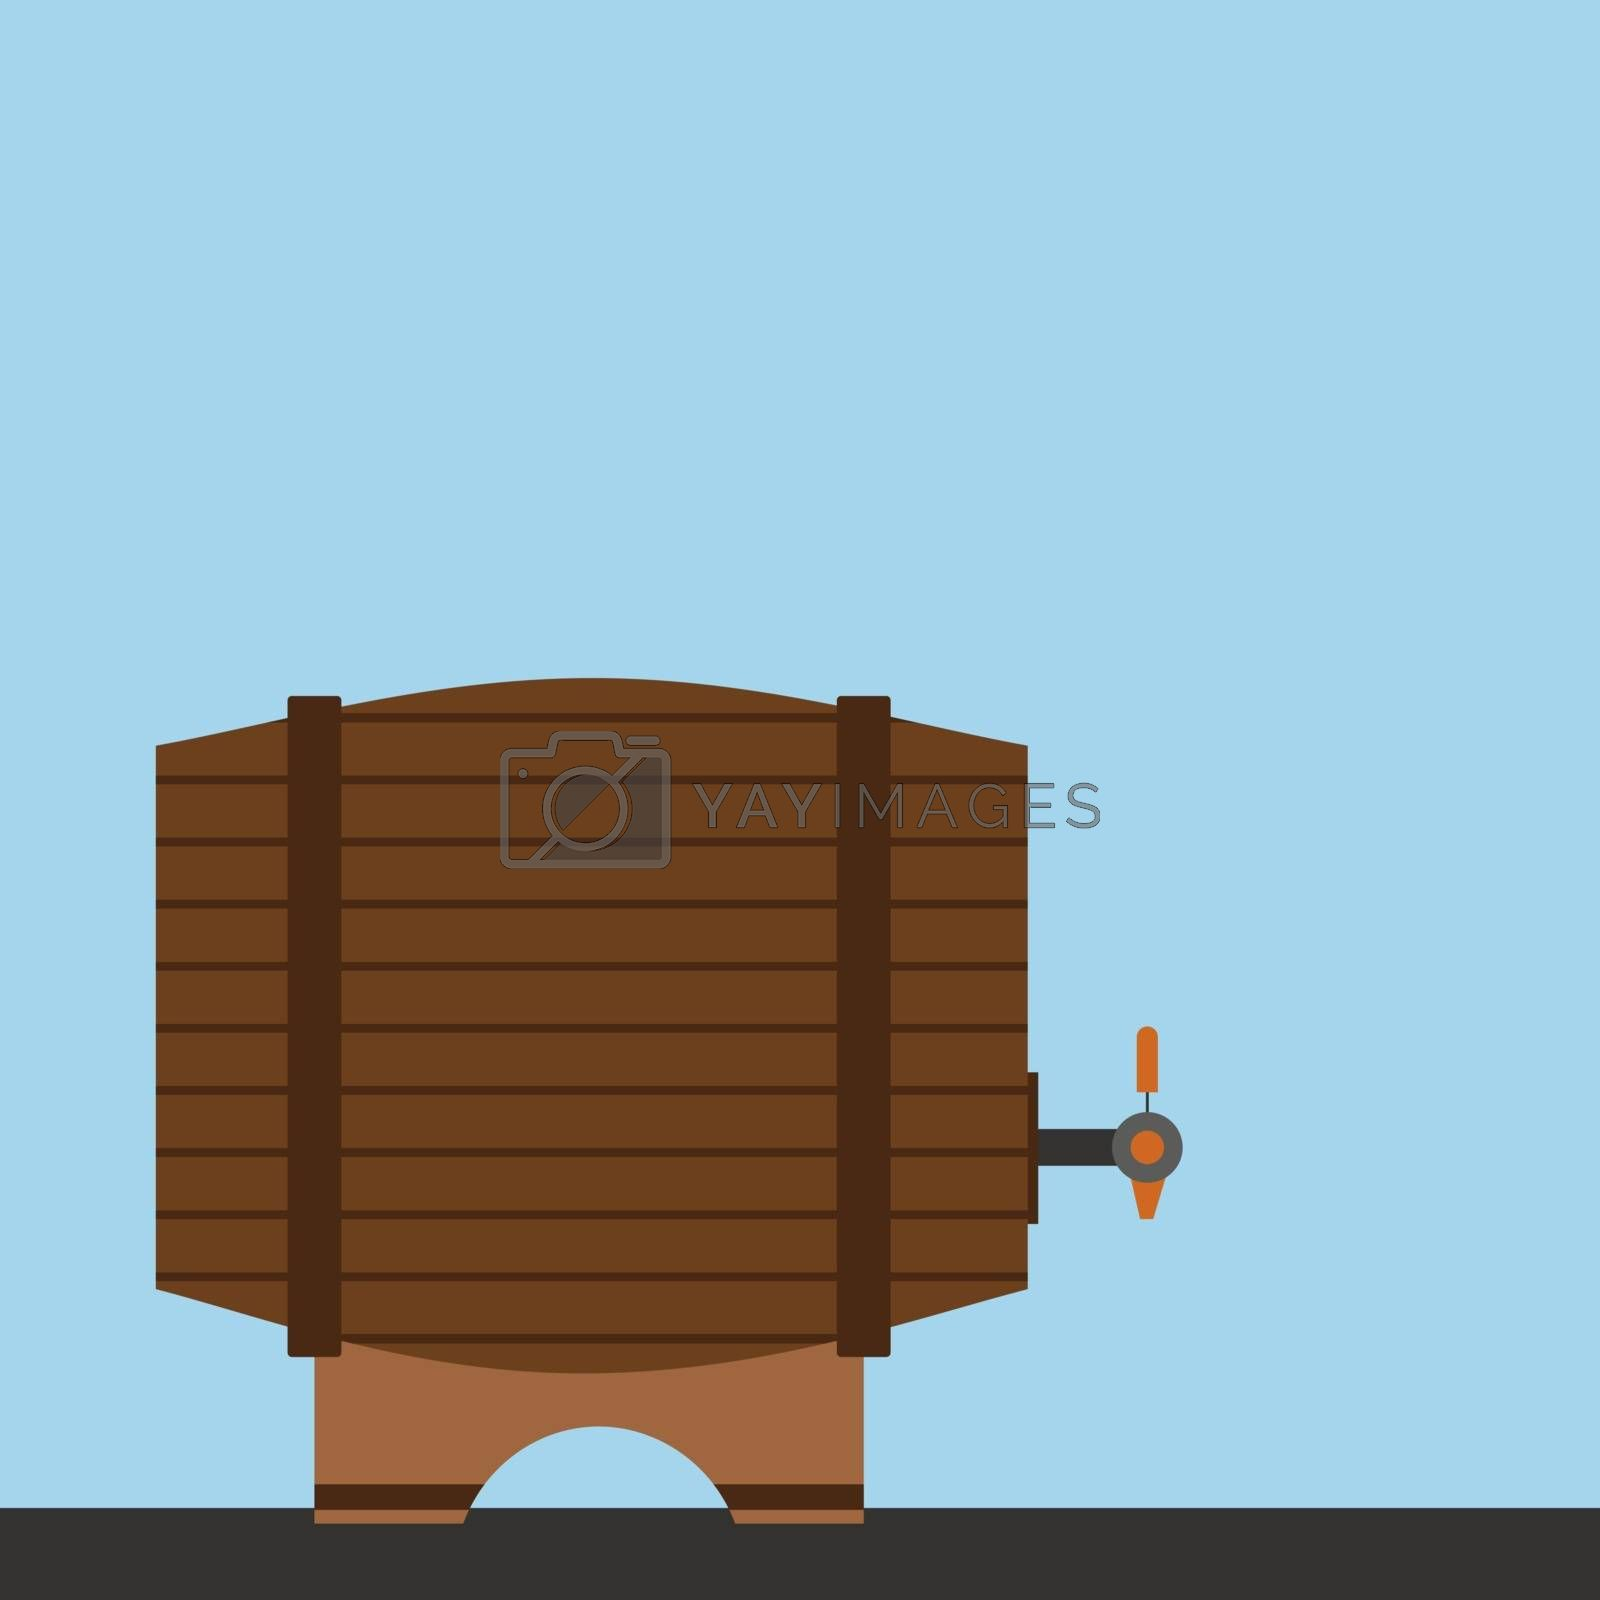 Wooden barrel, illustration, vector on white background.